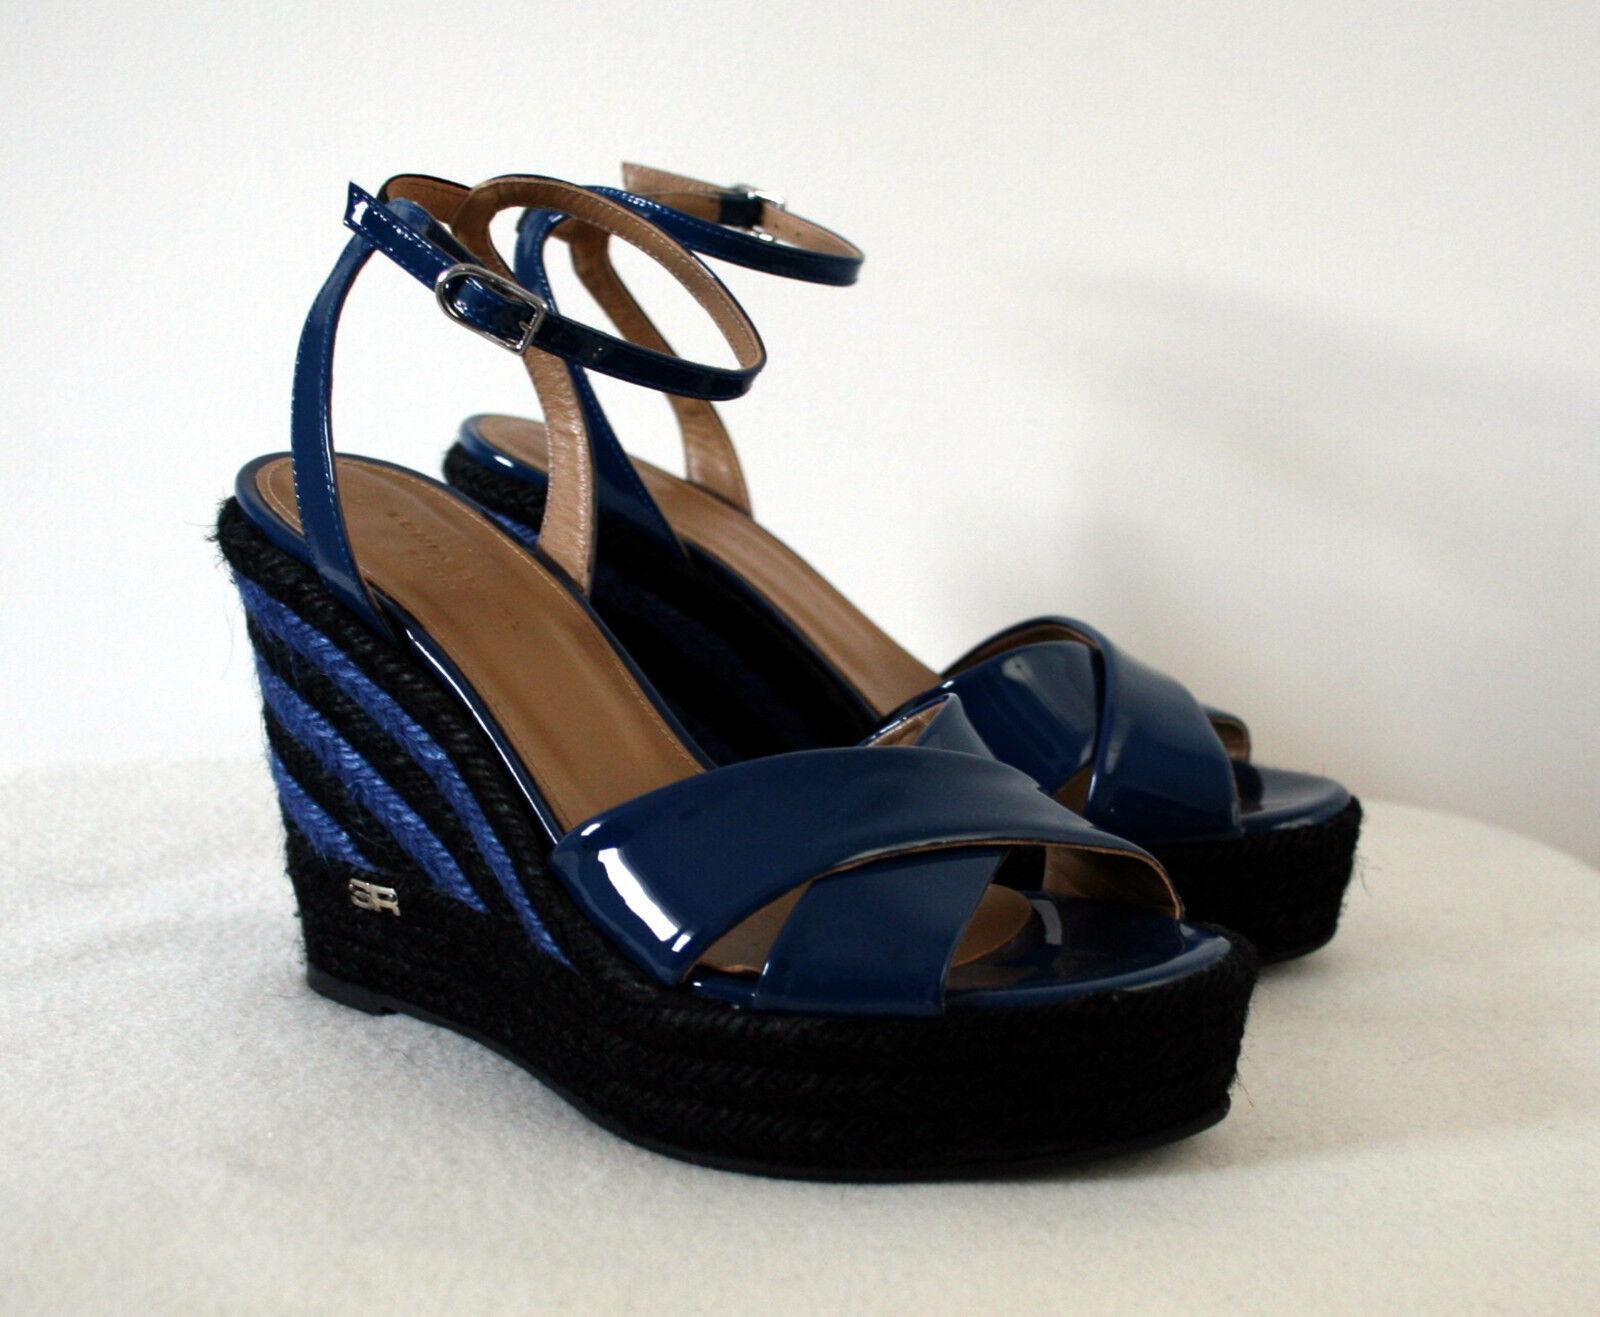 sonia sonia sonia rykiel brevets nouvelles sandales en cuir bleu / noir taille 38 () | Soldes  fbbcd5